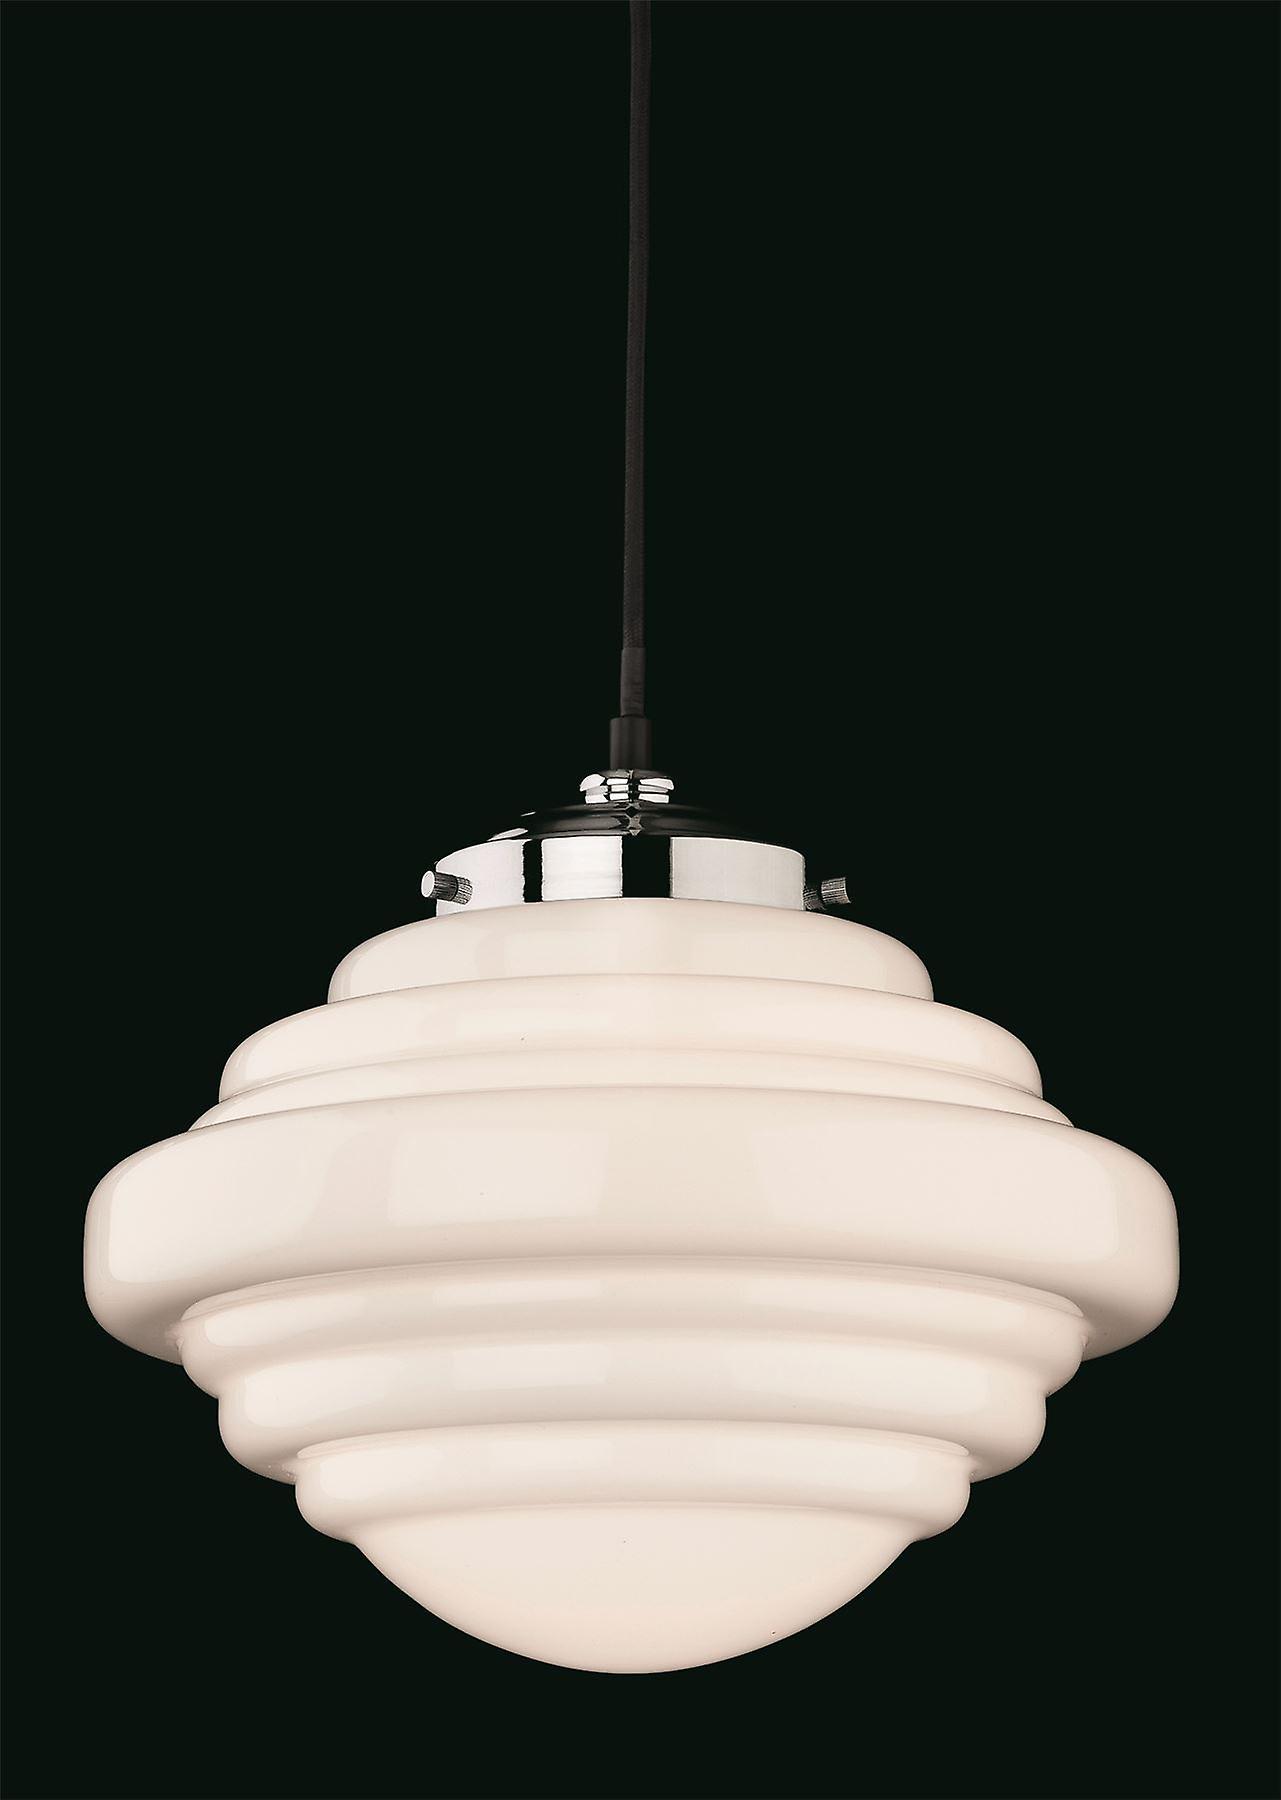 Firstlight - 1 Light Ceiling Pendant Chrome, Opal blanc Glass - 4948CH